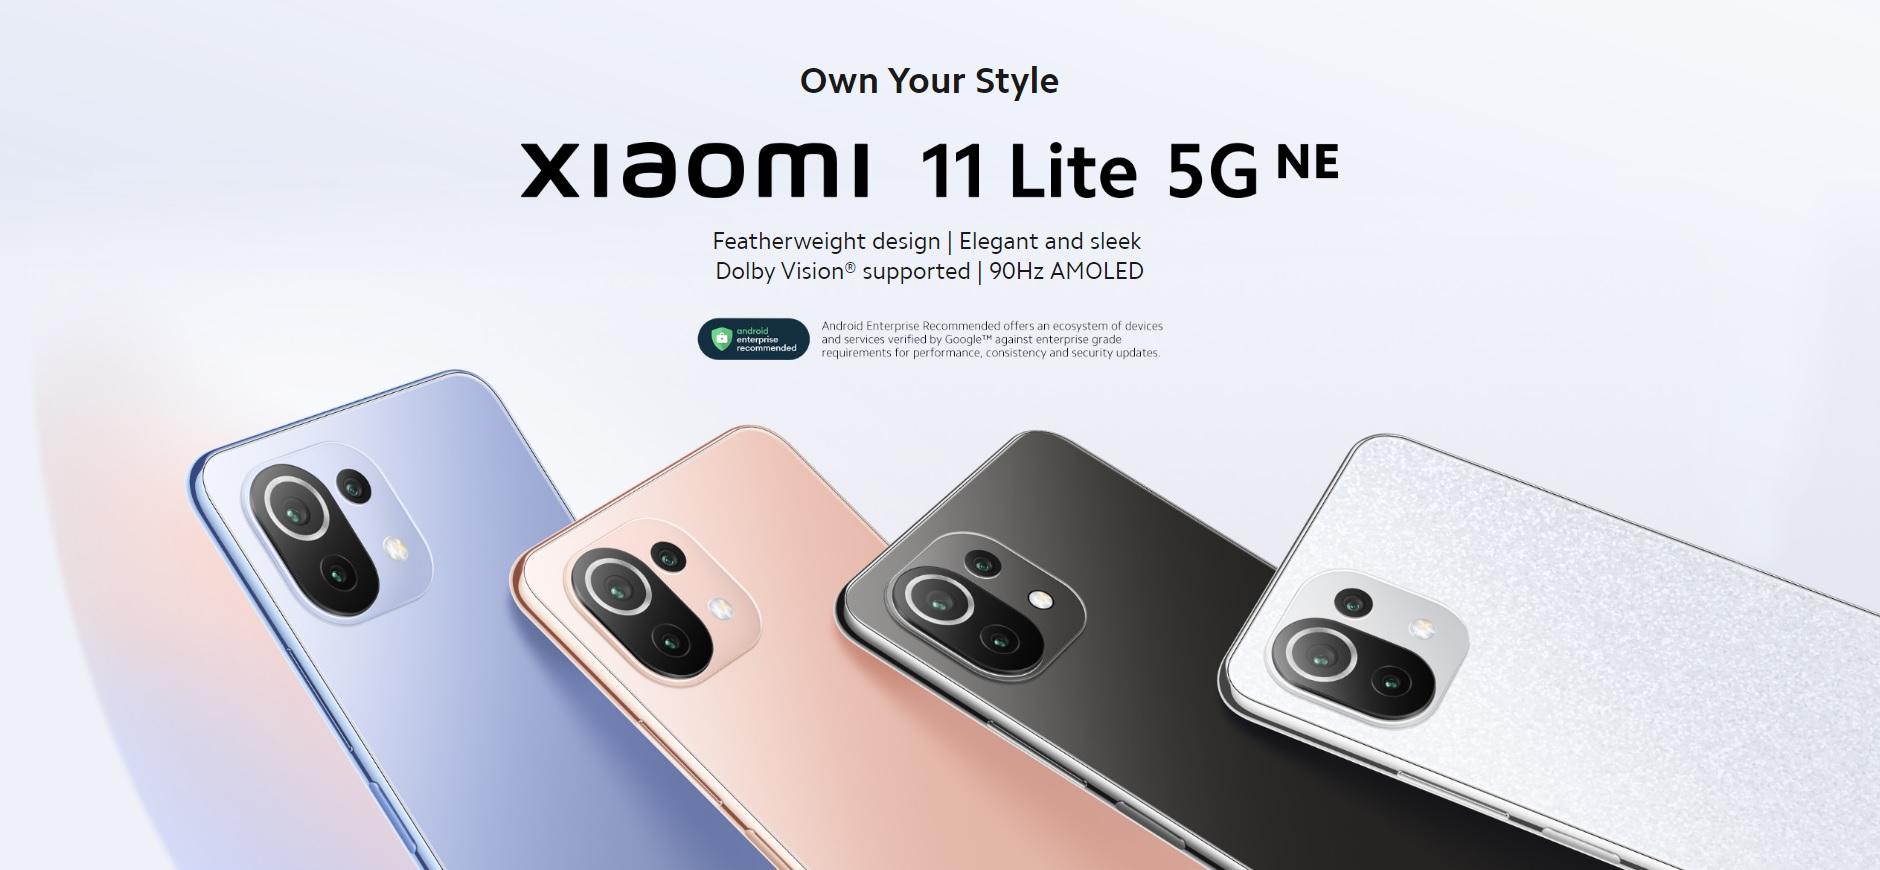 smartfon Xiaomi 11 Lite 5G NE smartphone